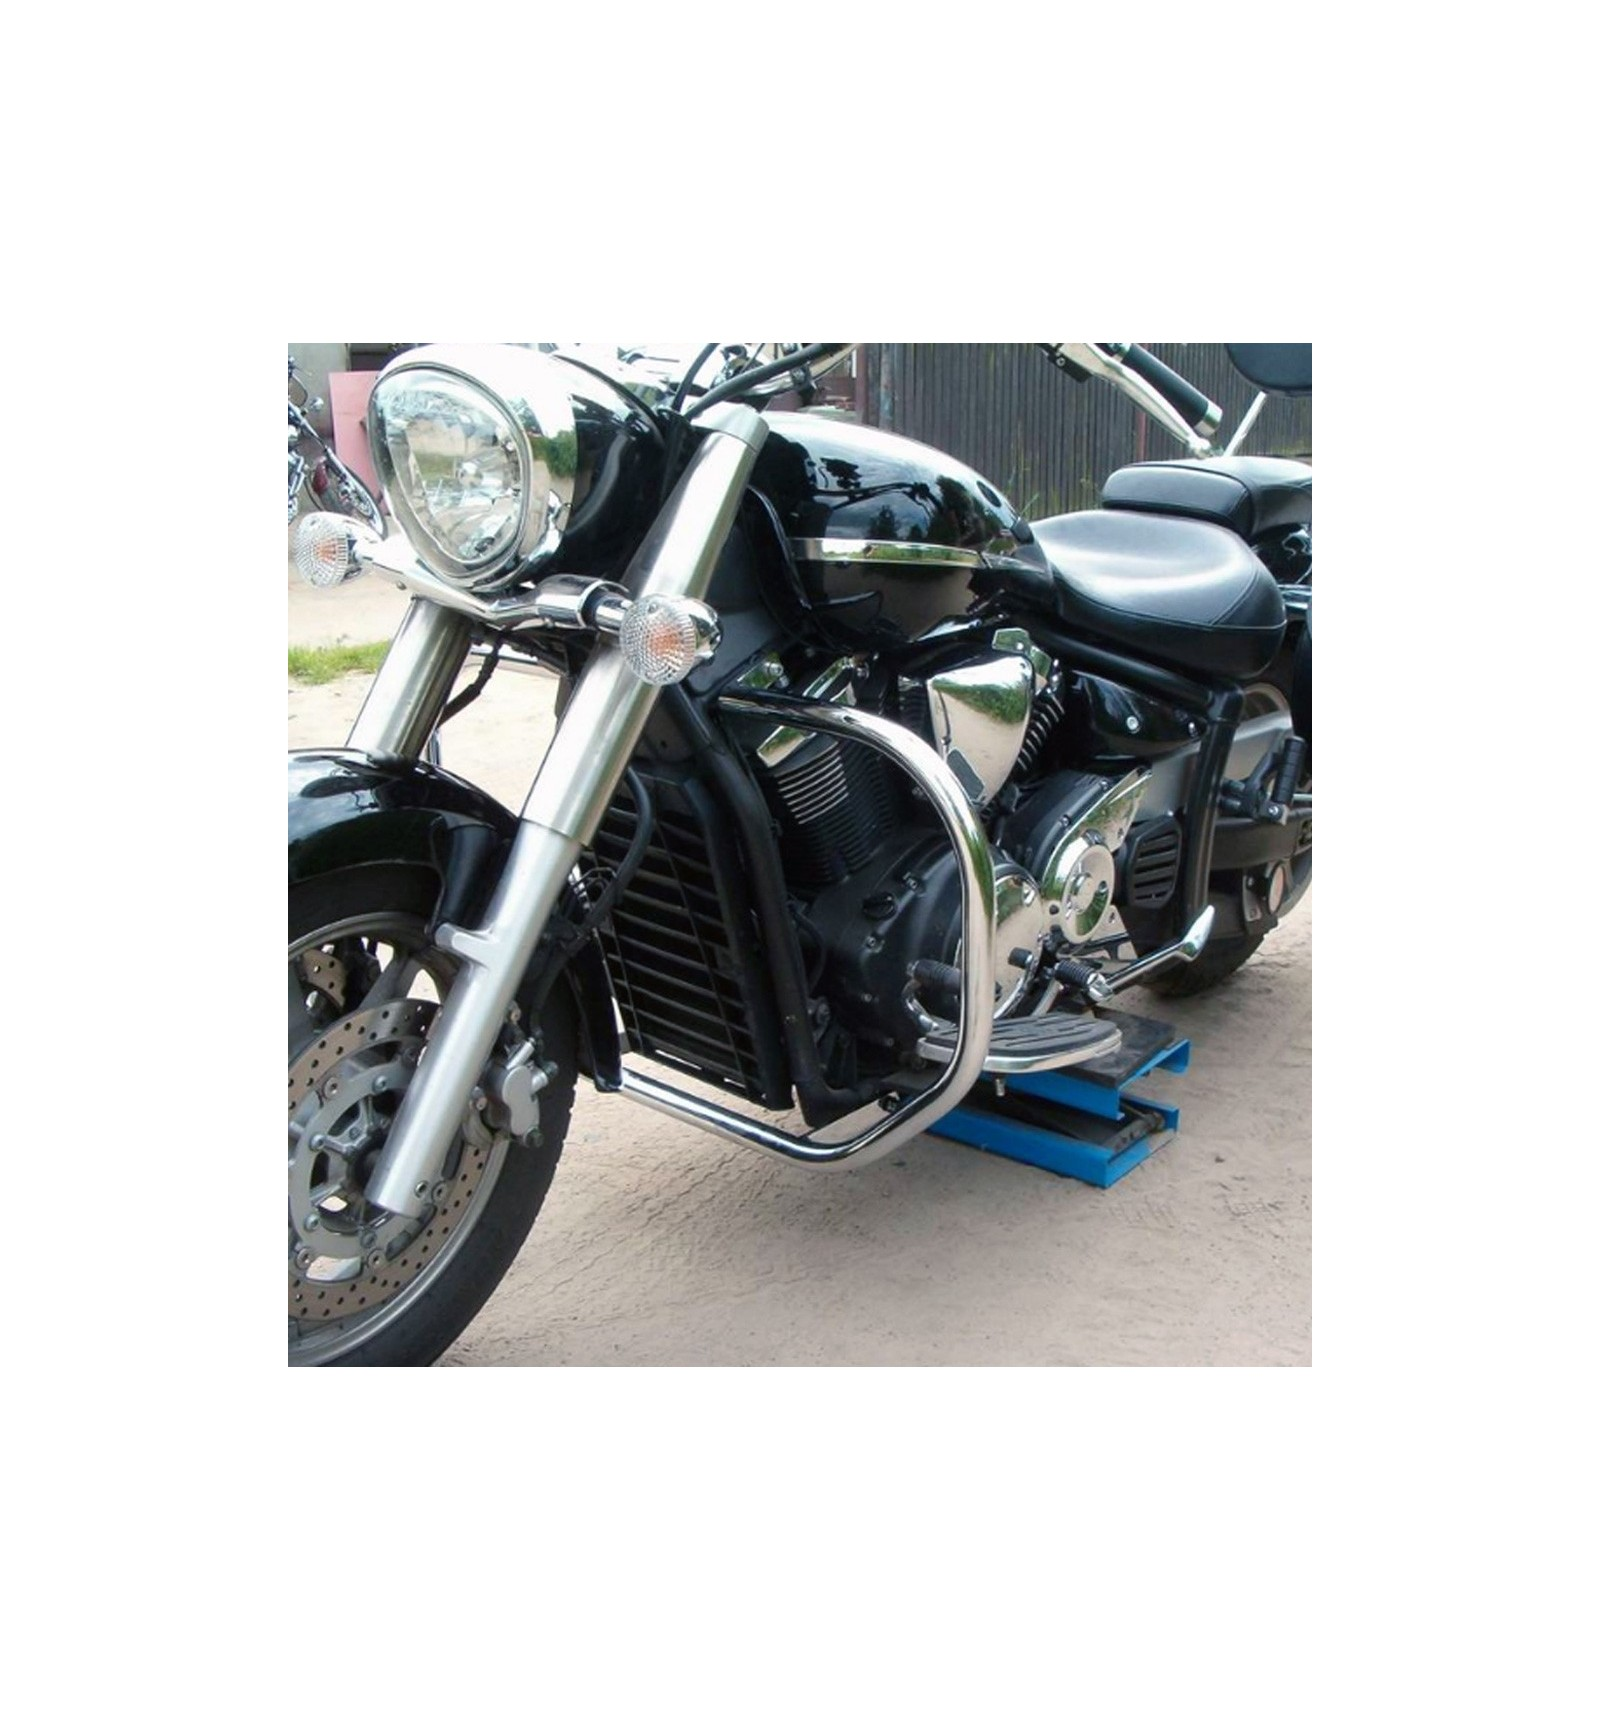 yamaha xvs 1300 midnight star chrome engine crash bar. Black Bedroom Furniture Sets. Home Design Ideas